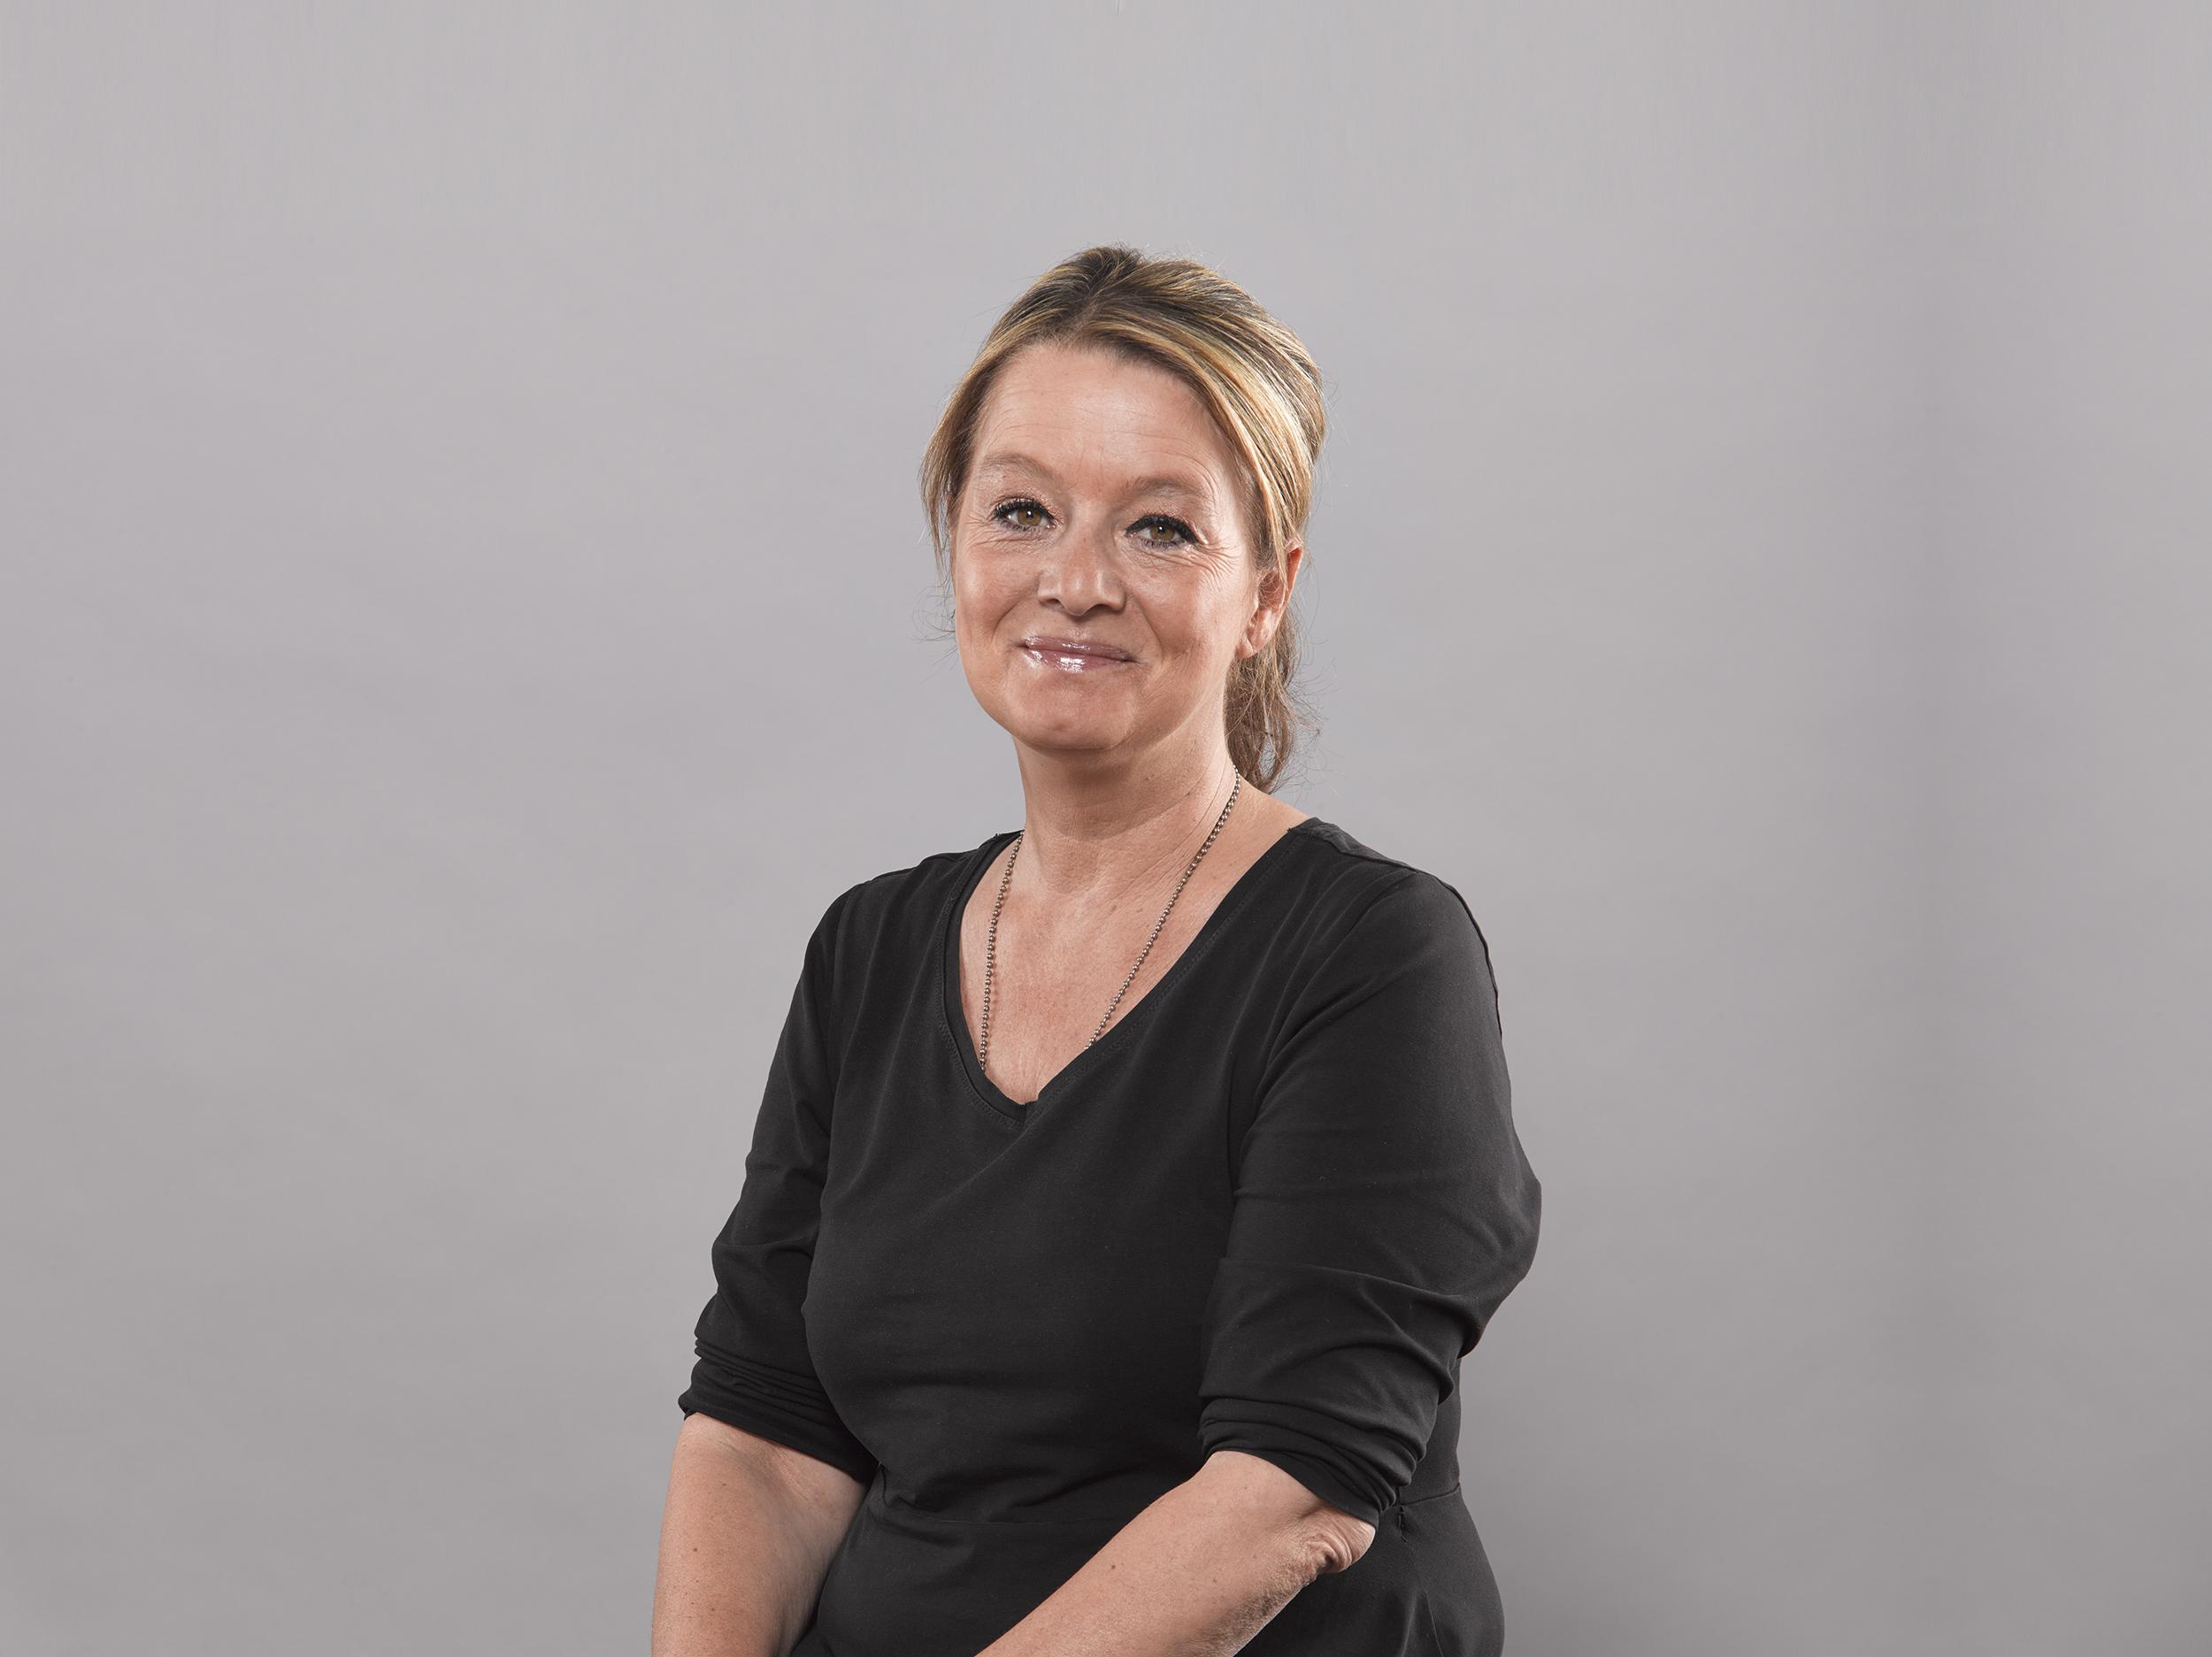 Susanne Bühler